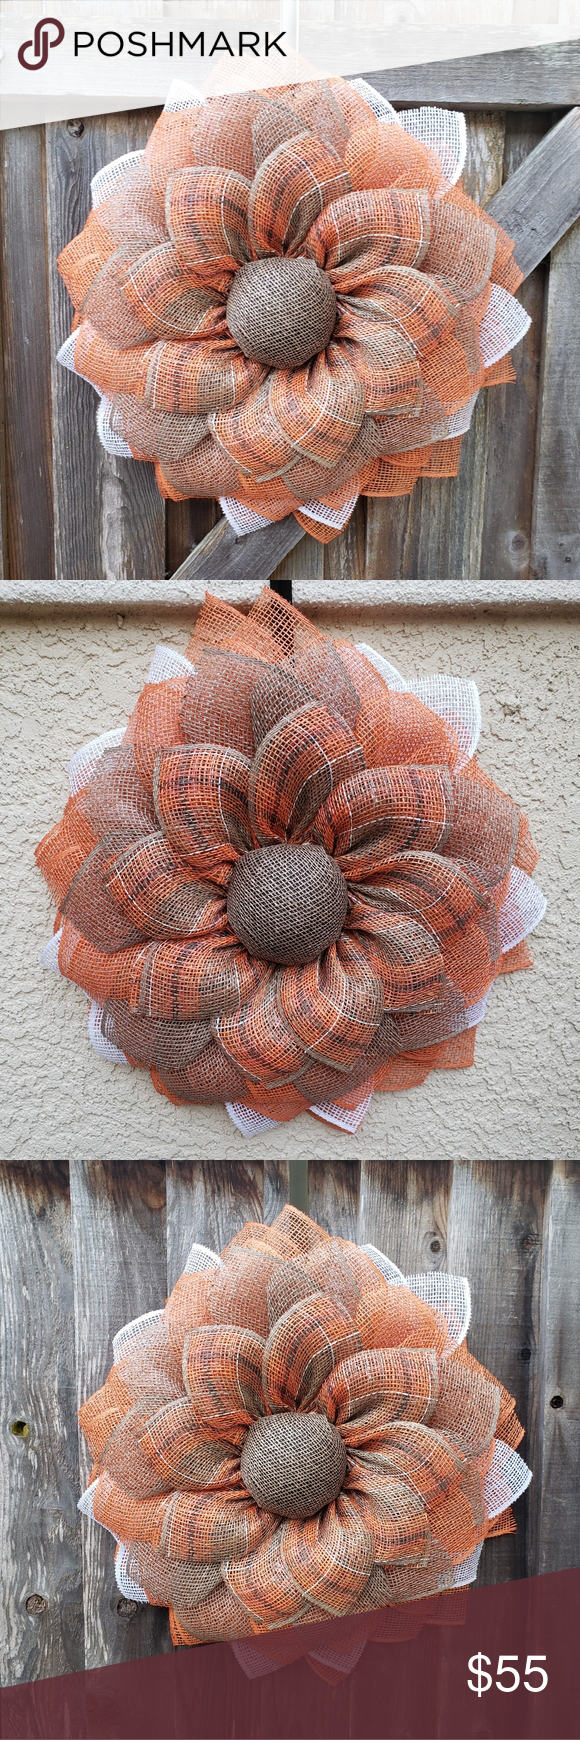 Photo of Handmade sunflower wreath, Door Wreath,Fall,Spring Handmade Made to Order 3D sun…